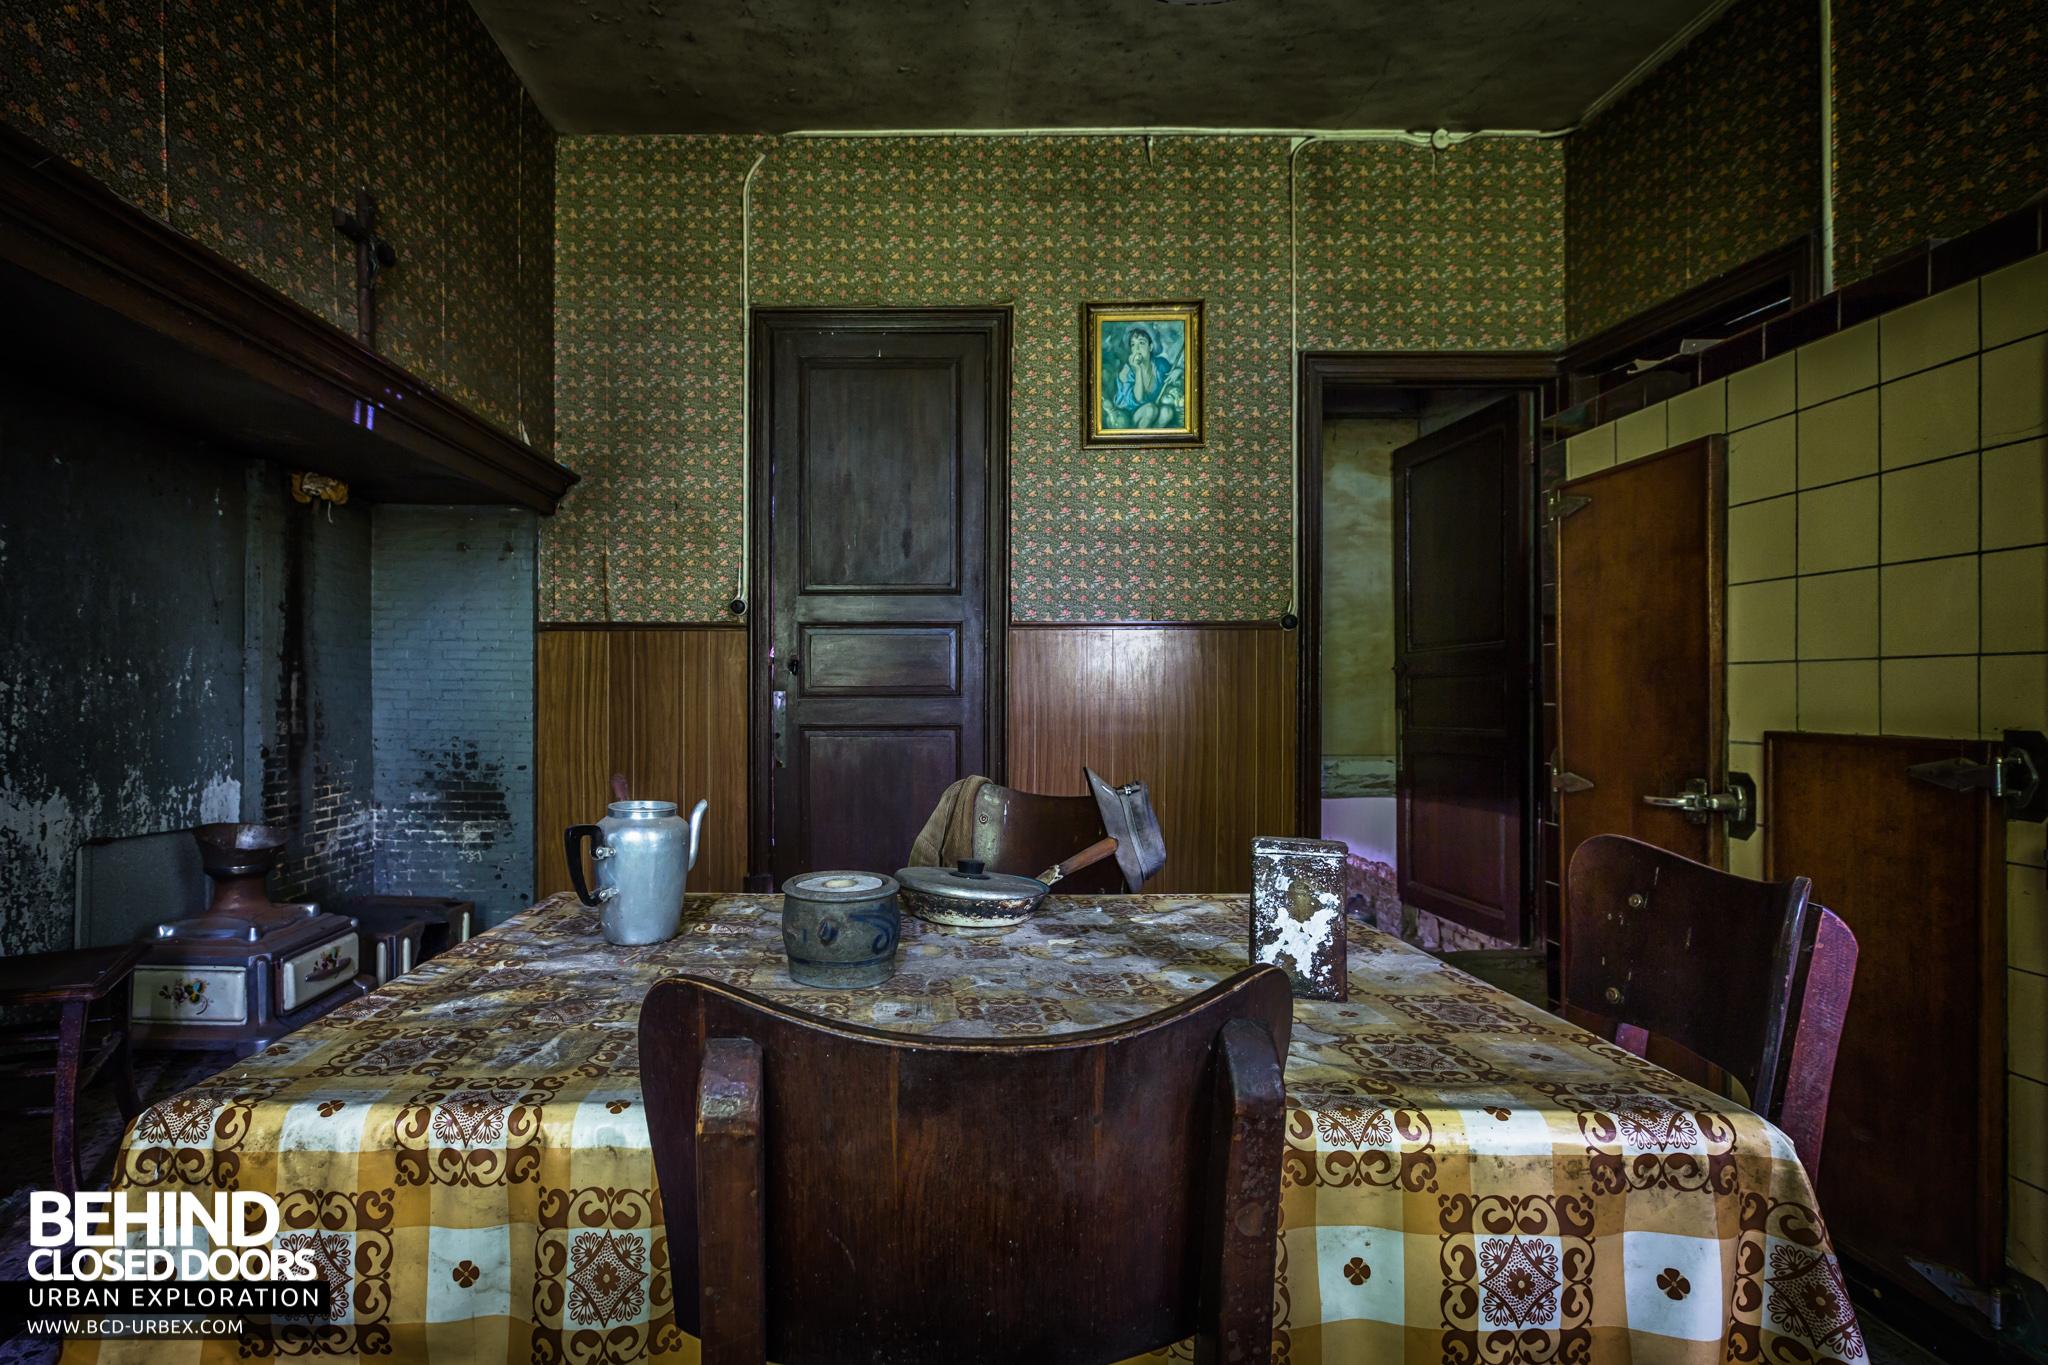 Maison Gustaaf Abandoned House Belgium 187 Urbex Behind